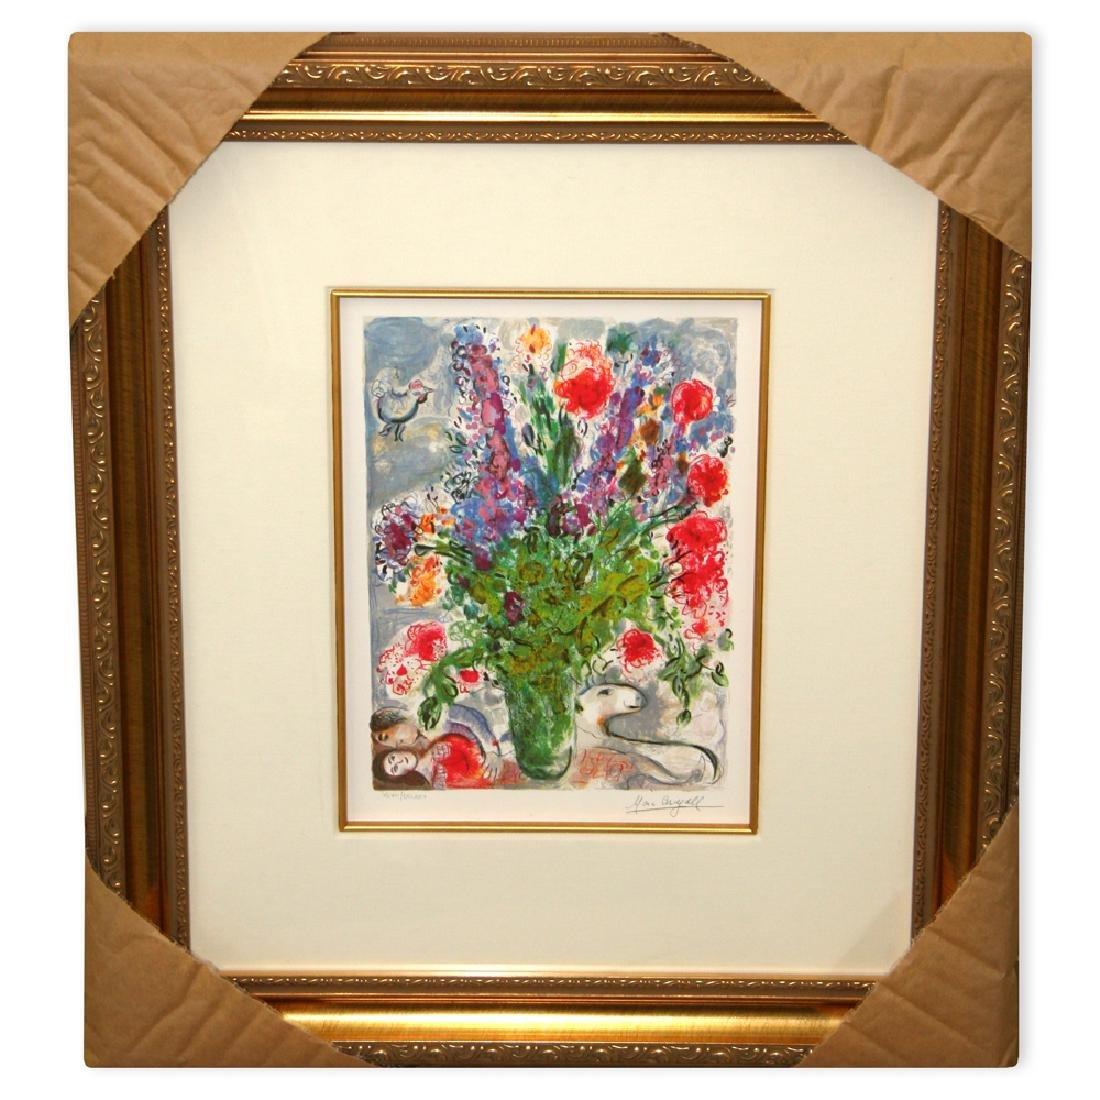 Chagall (After) 'Les Lupins Bleu' Museum Framed